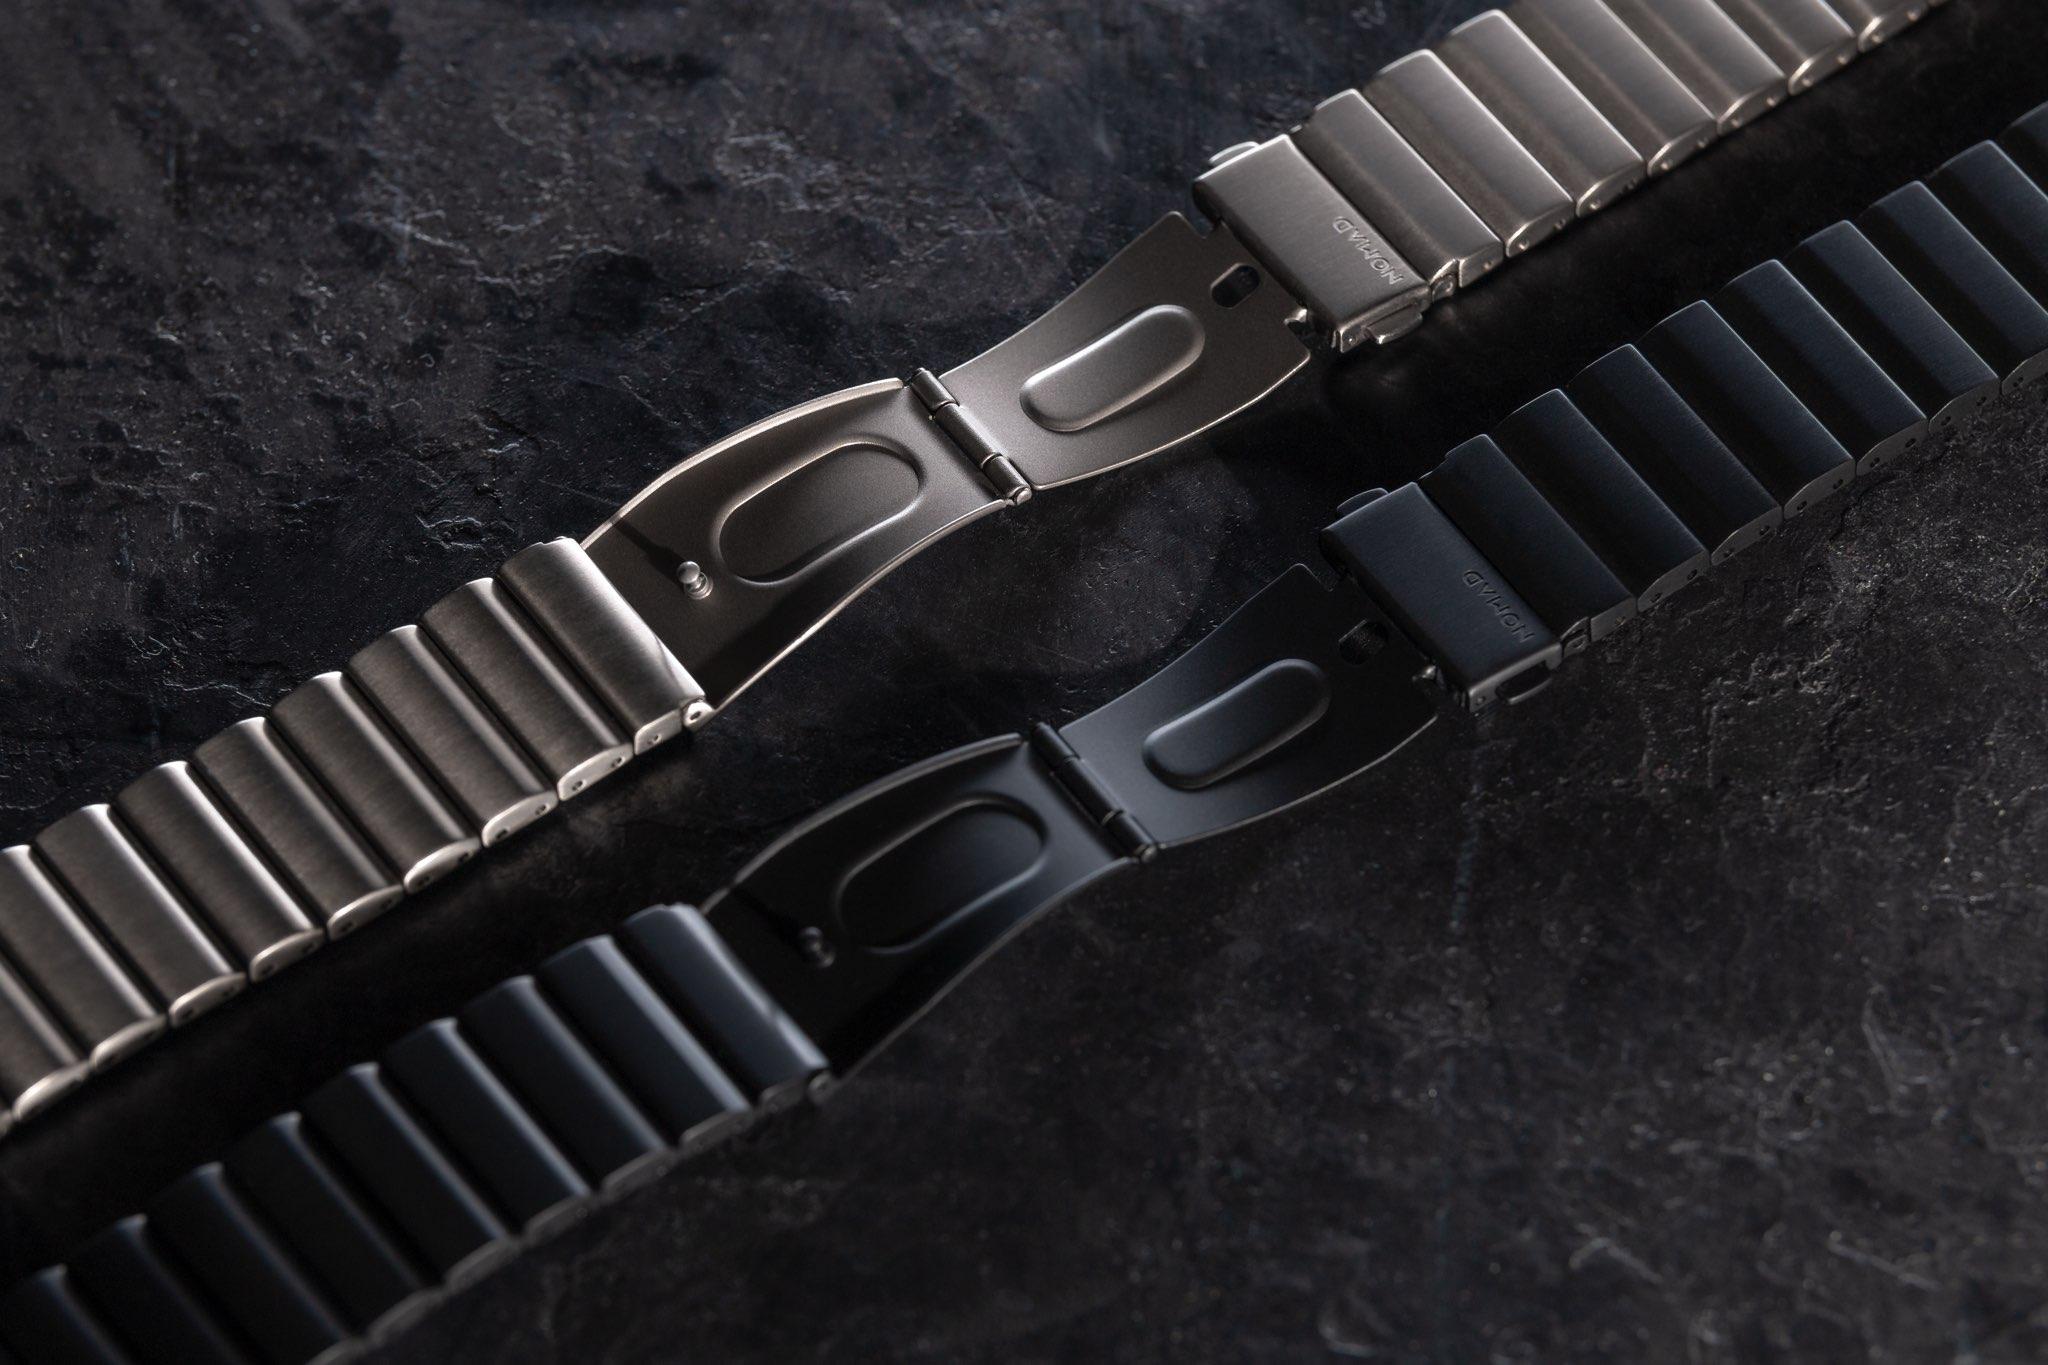 Nomad's titanium Apple Watch band launches, resembles a high-end metal link bracelet